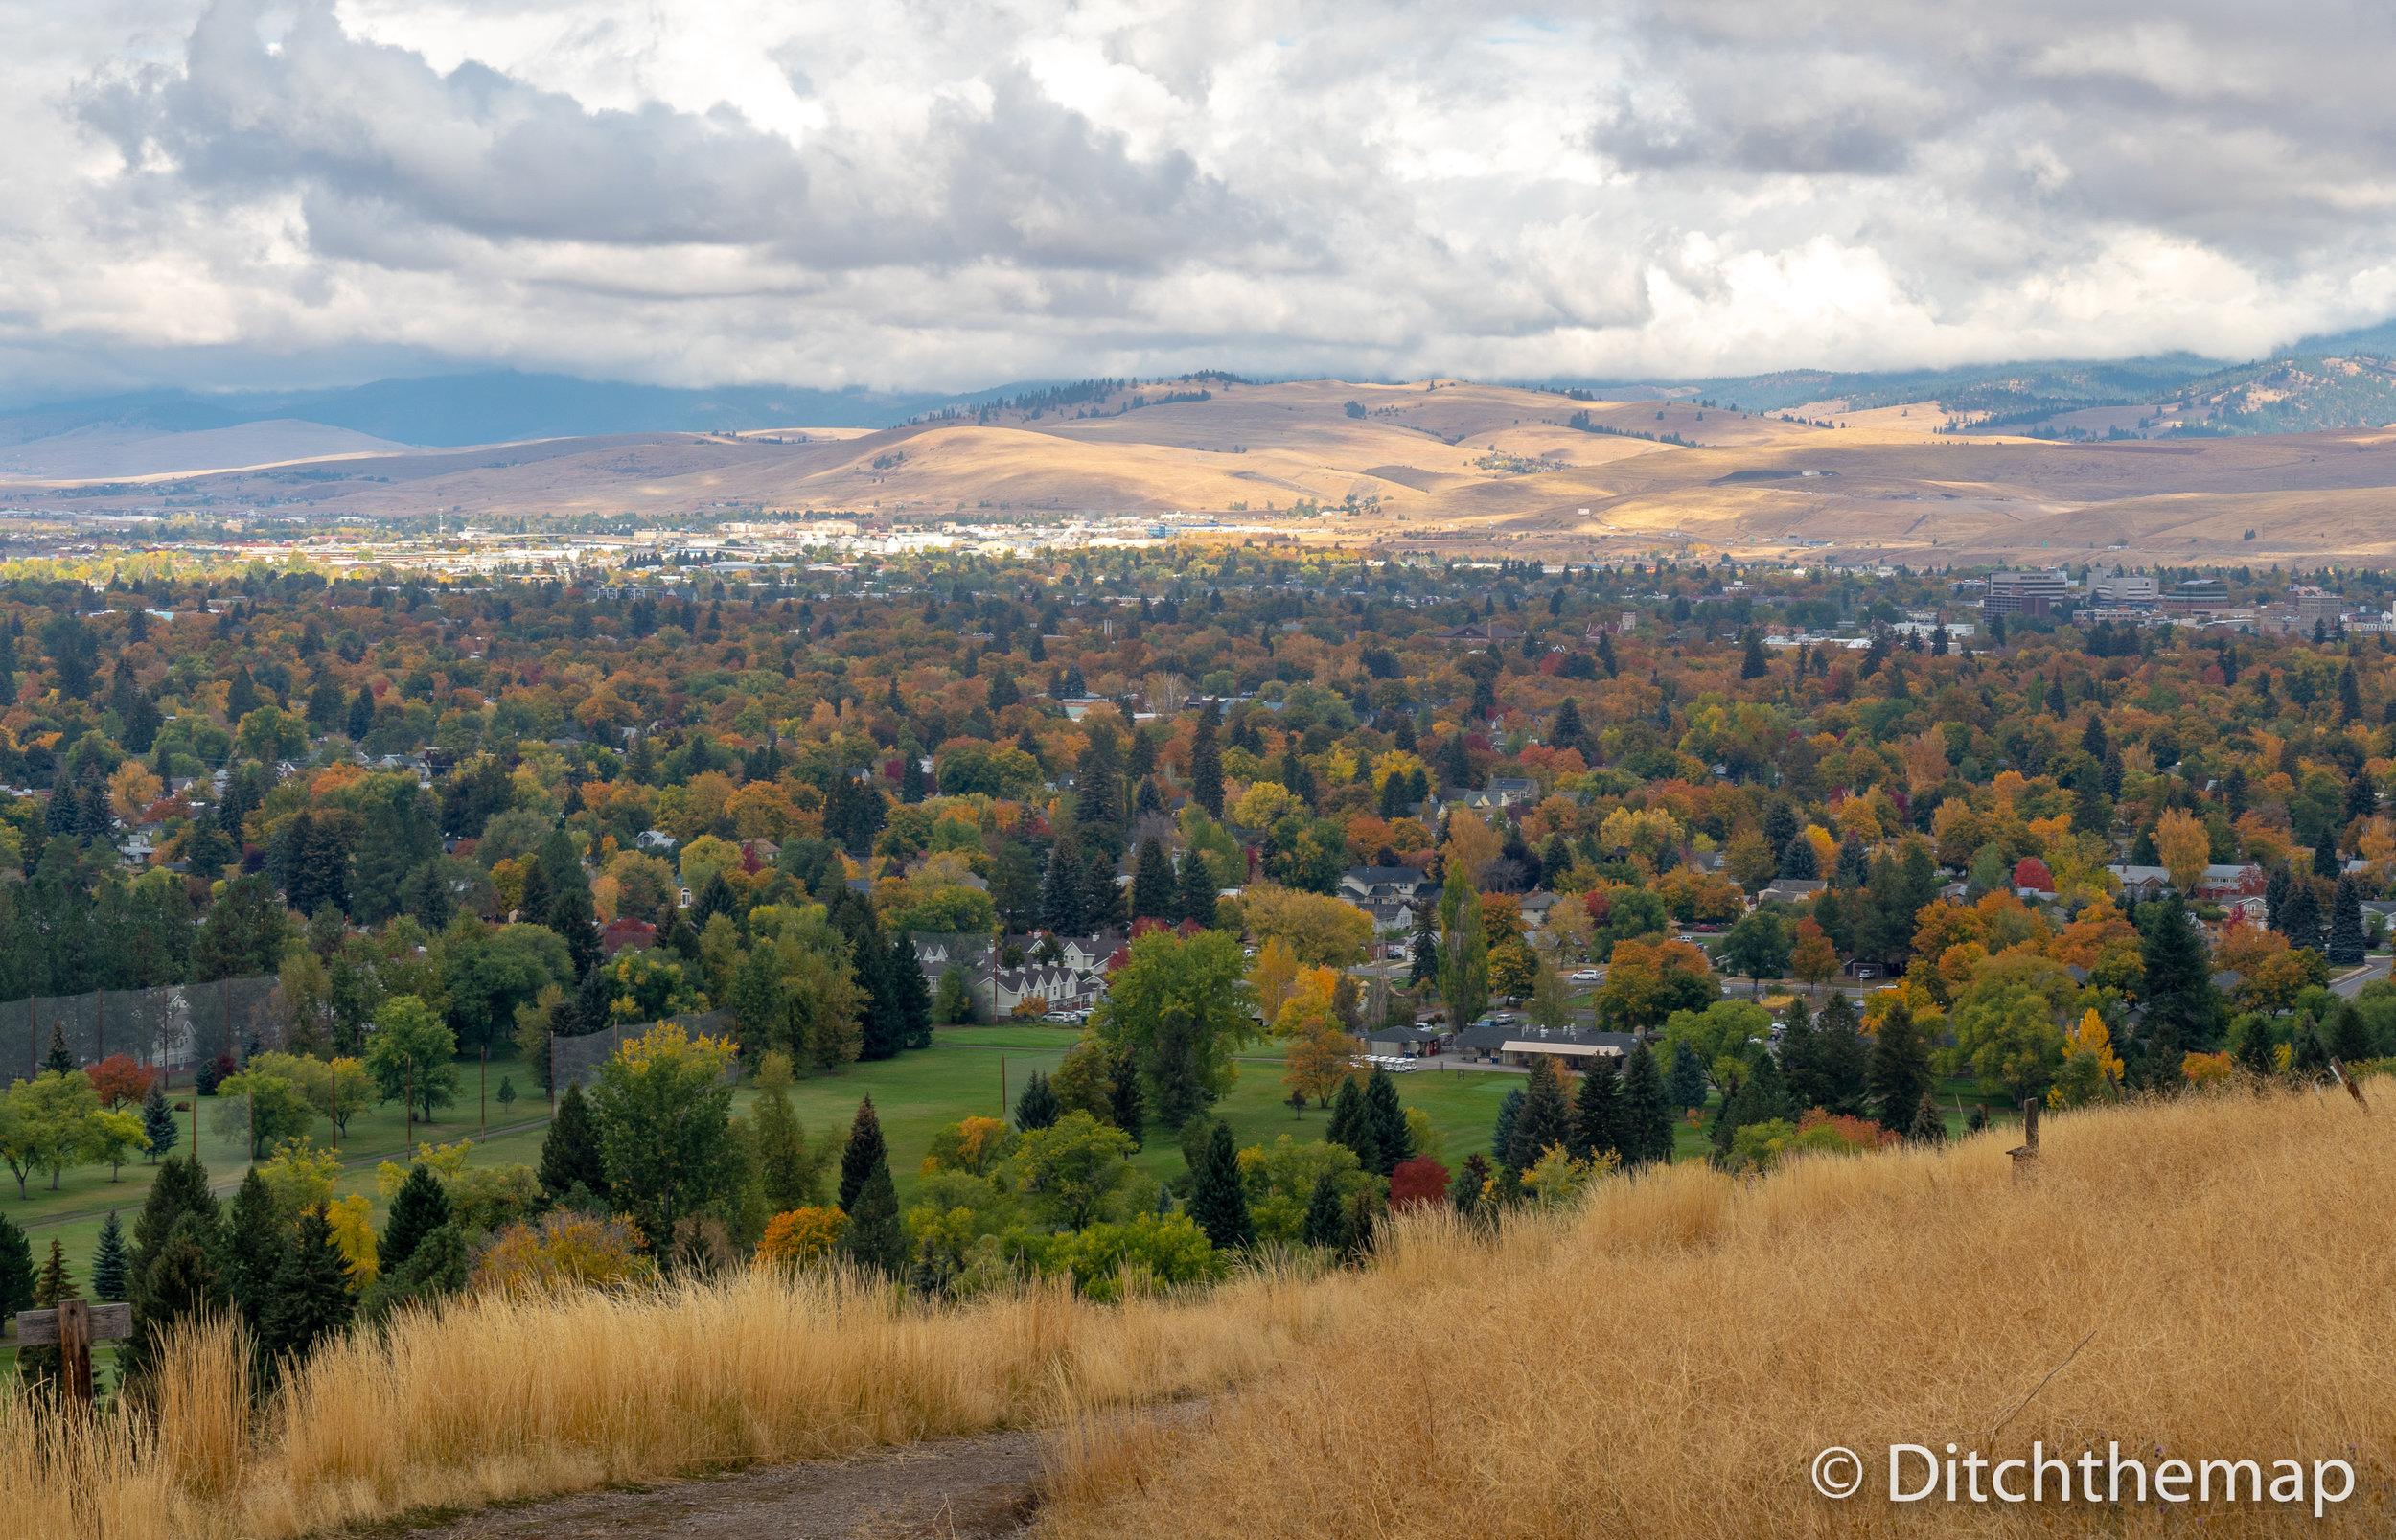 City of Missoula, Montana during autumn